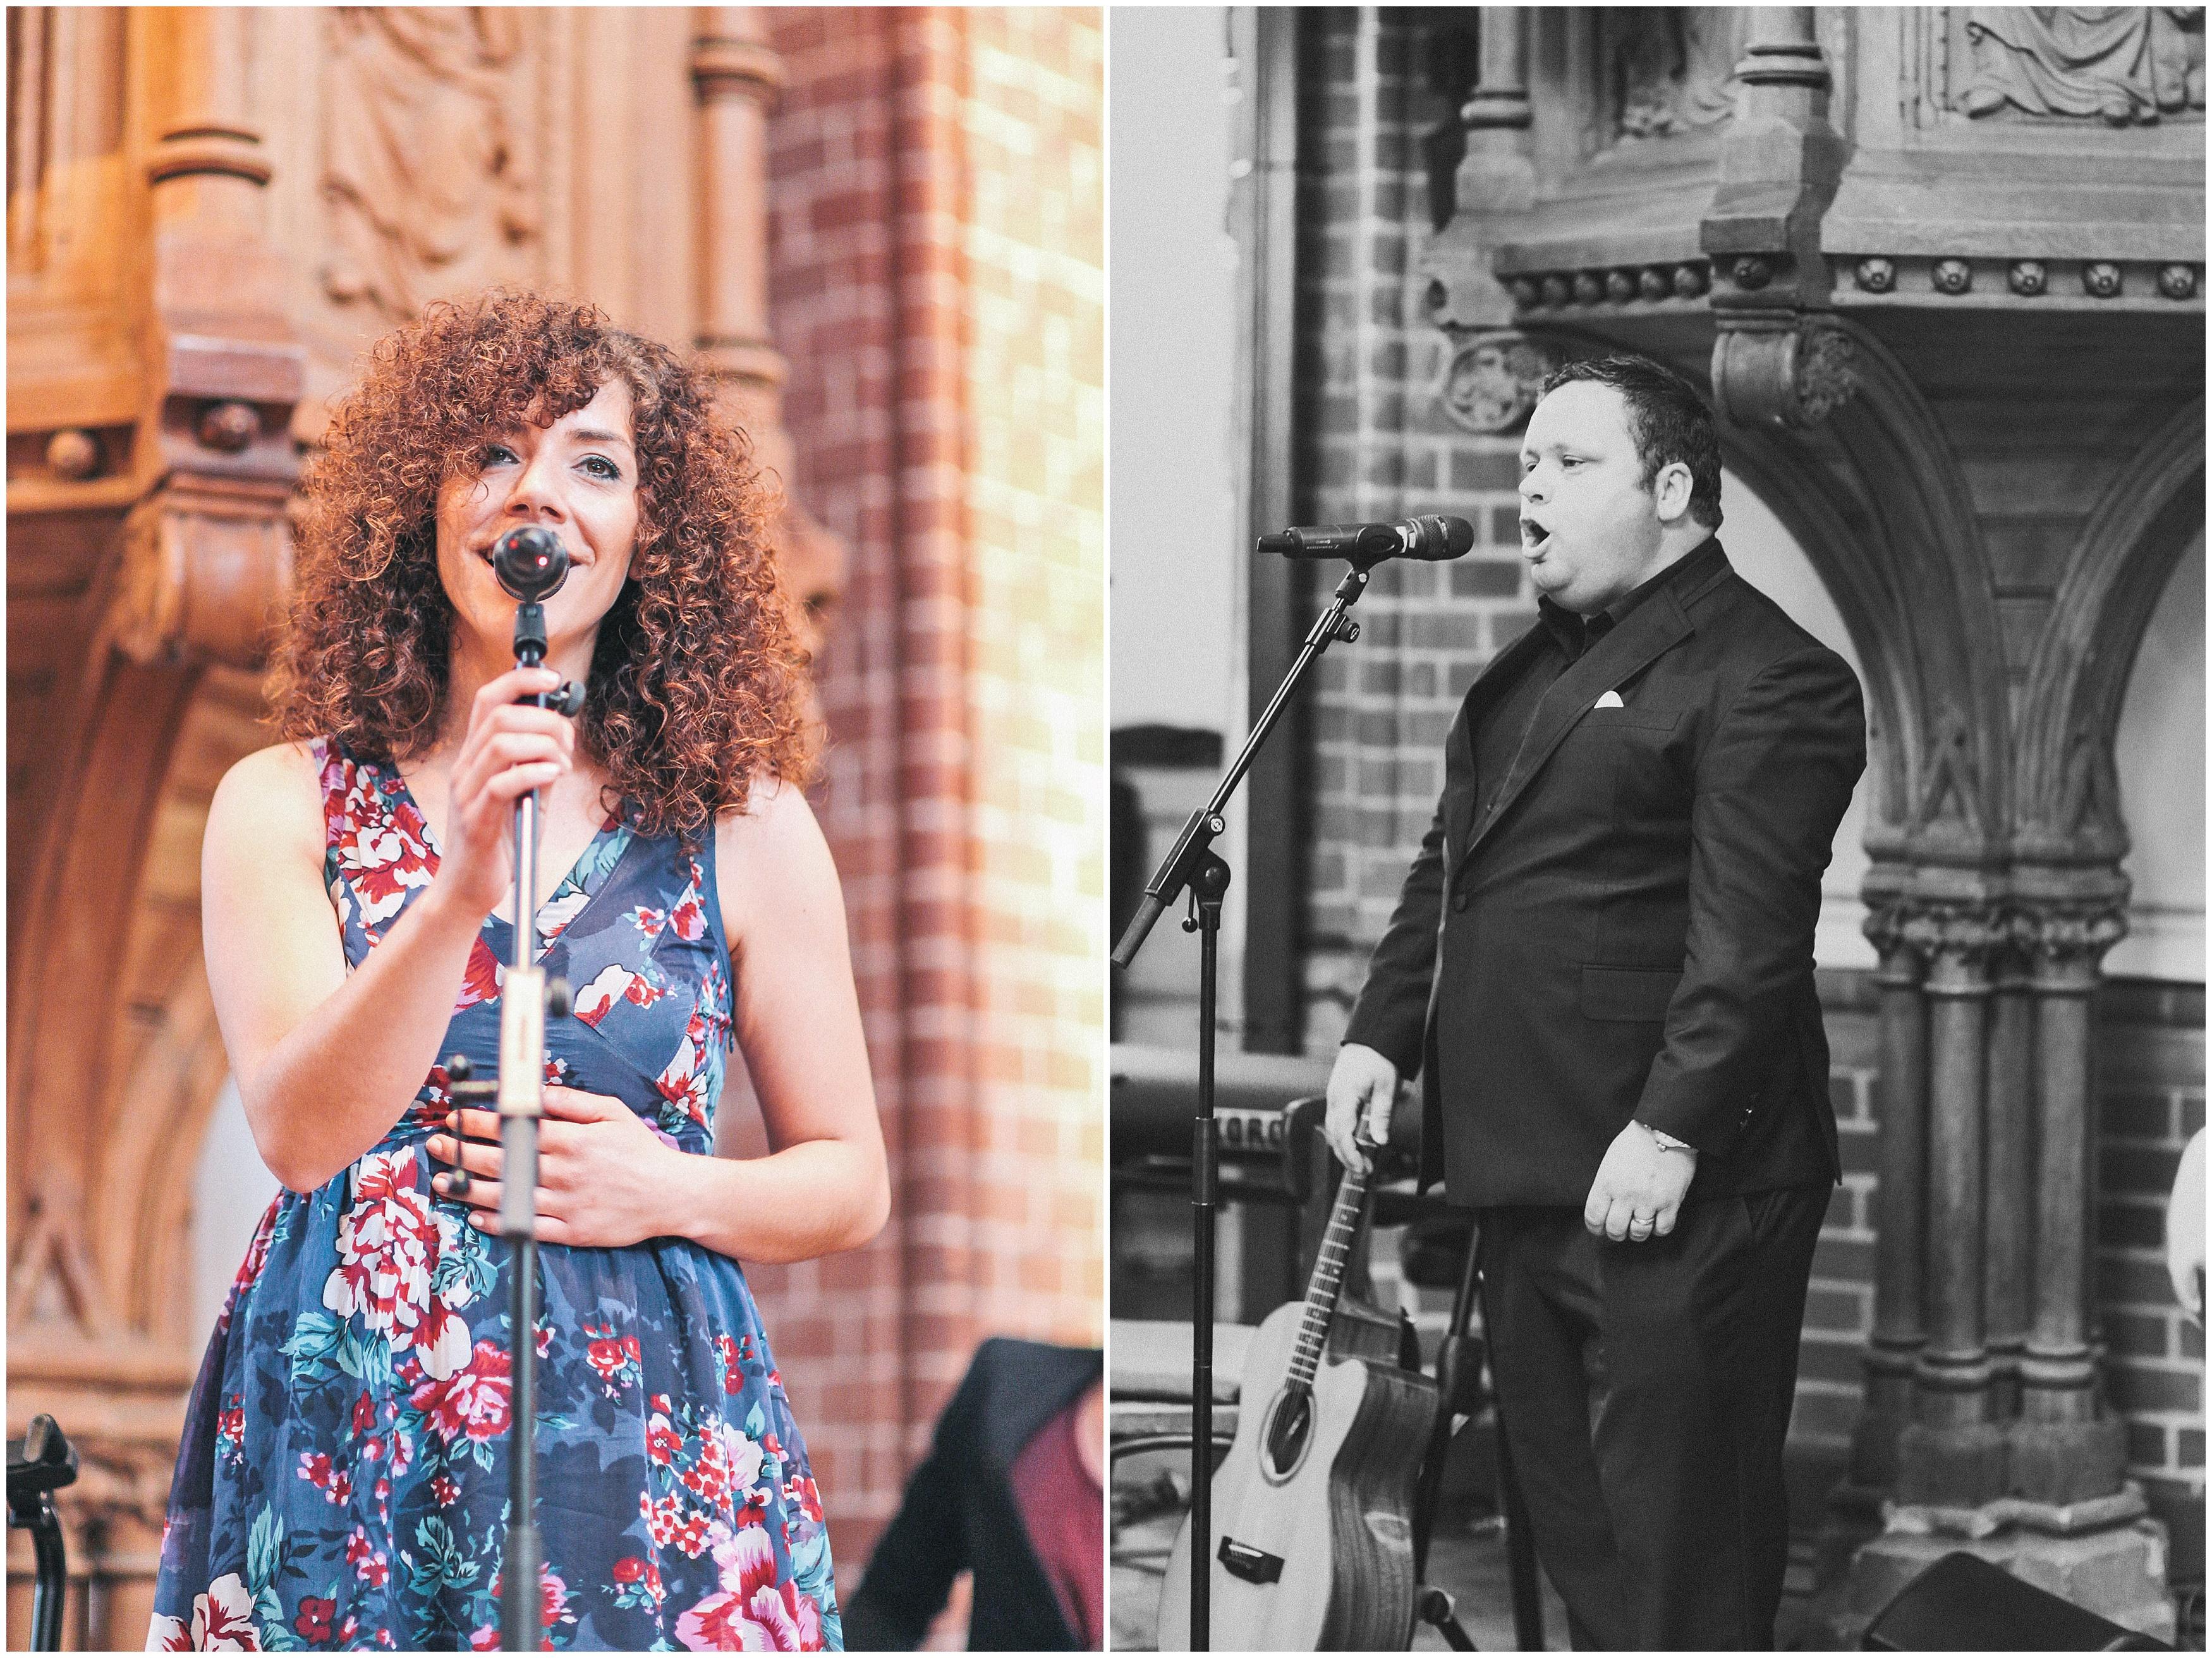 ivy&olive_Hochzeitsplanung_Nancy_Ebert_Fotografie_Vintage_Wedding_0013